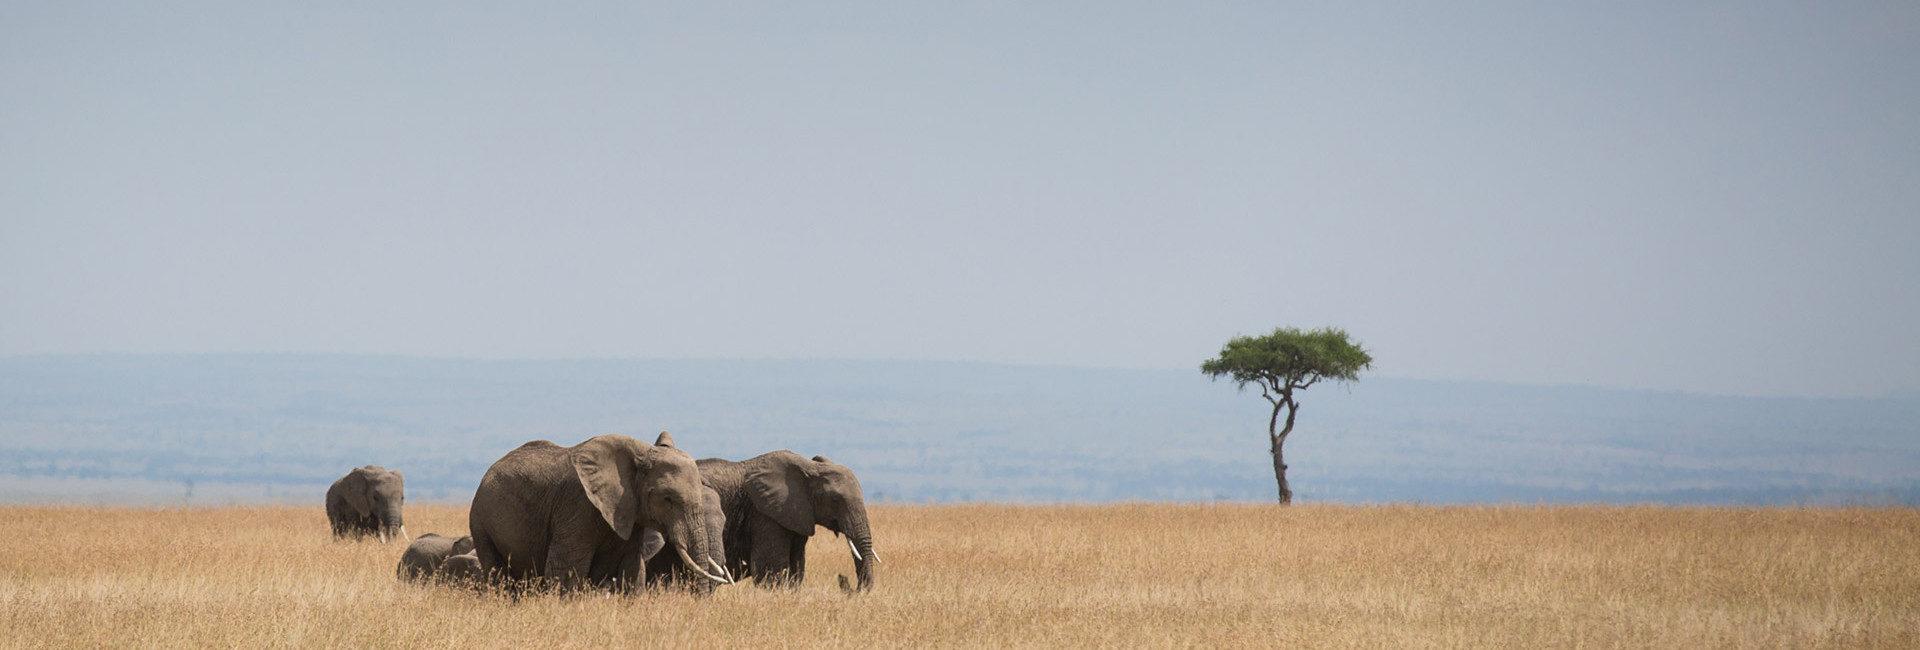 The absolute abundance of the Masai Mara